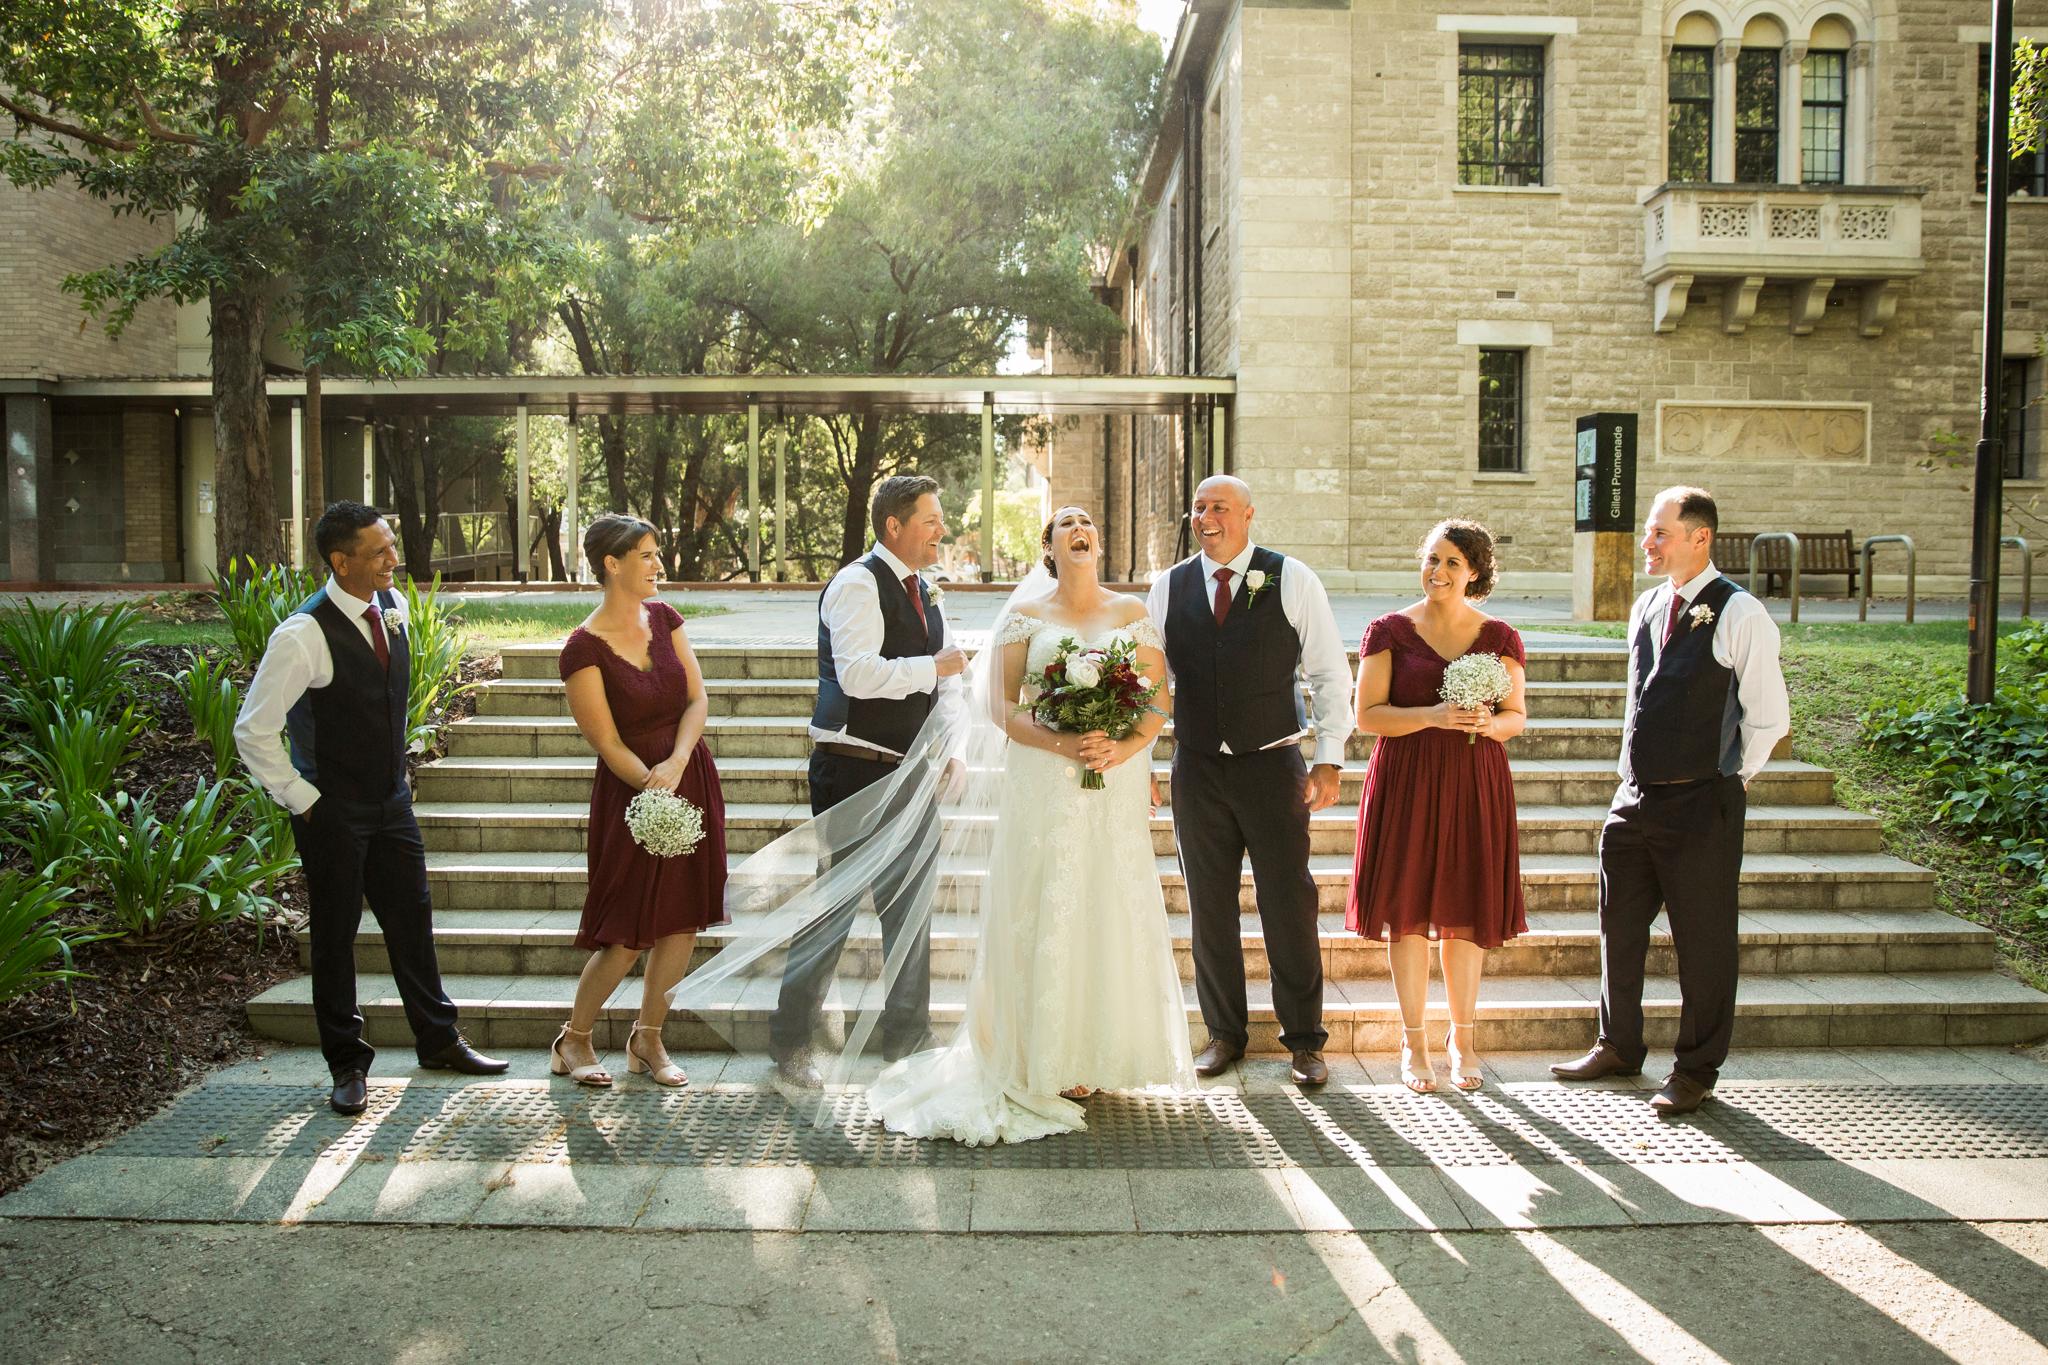 Kyme-steve-wedding-212.jpg